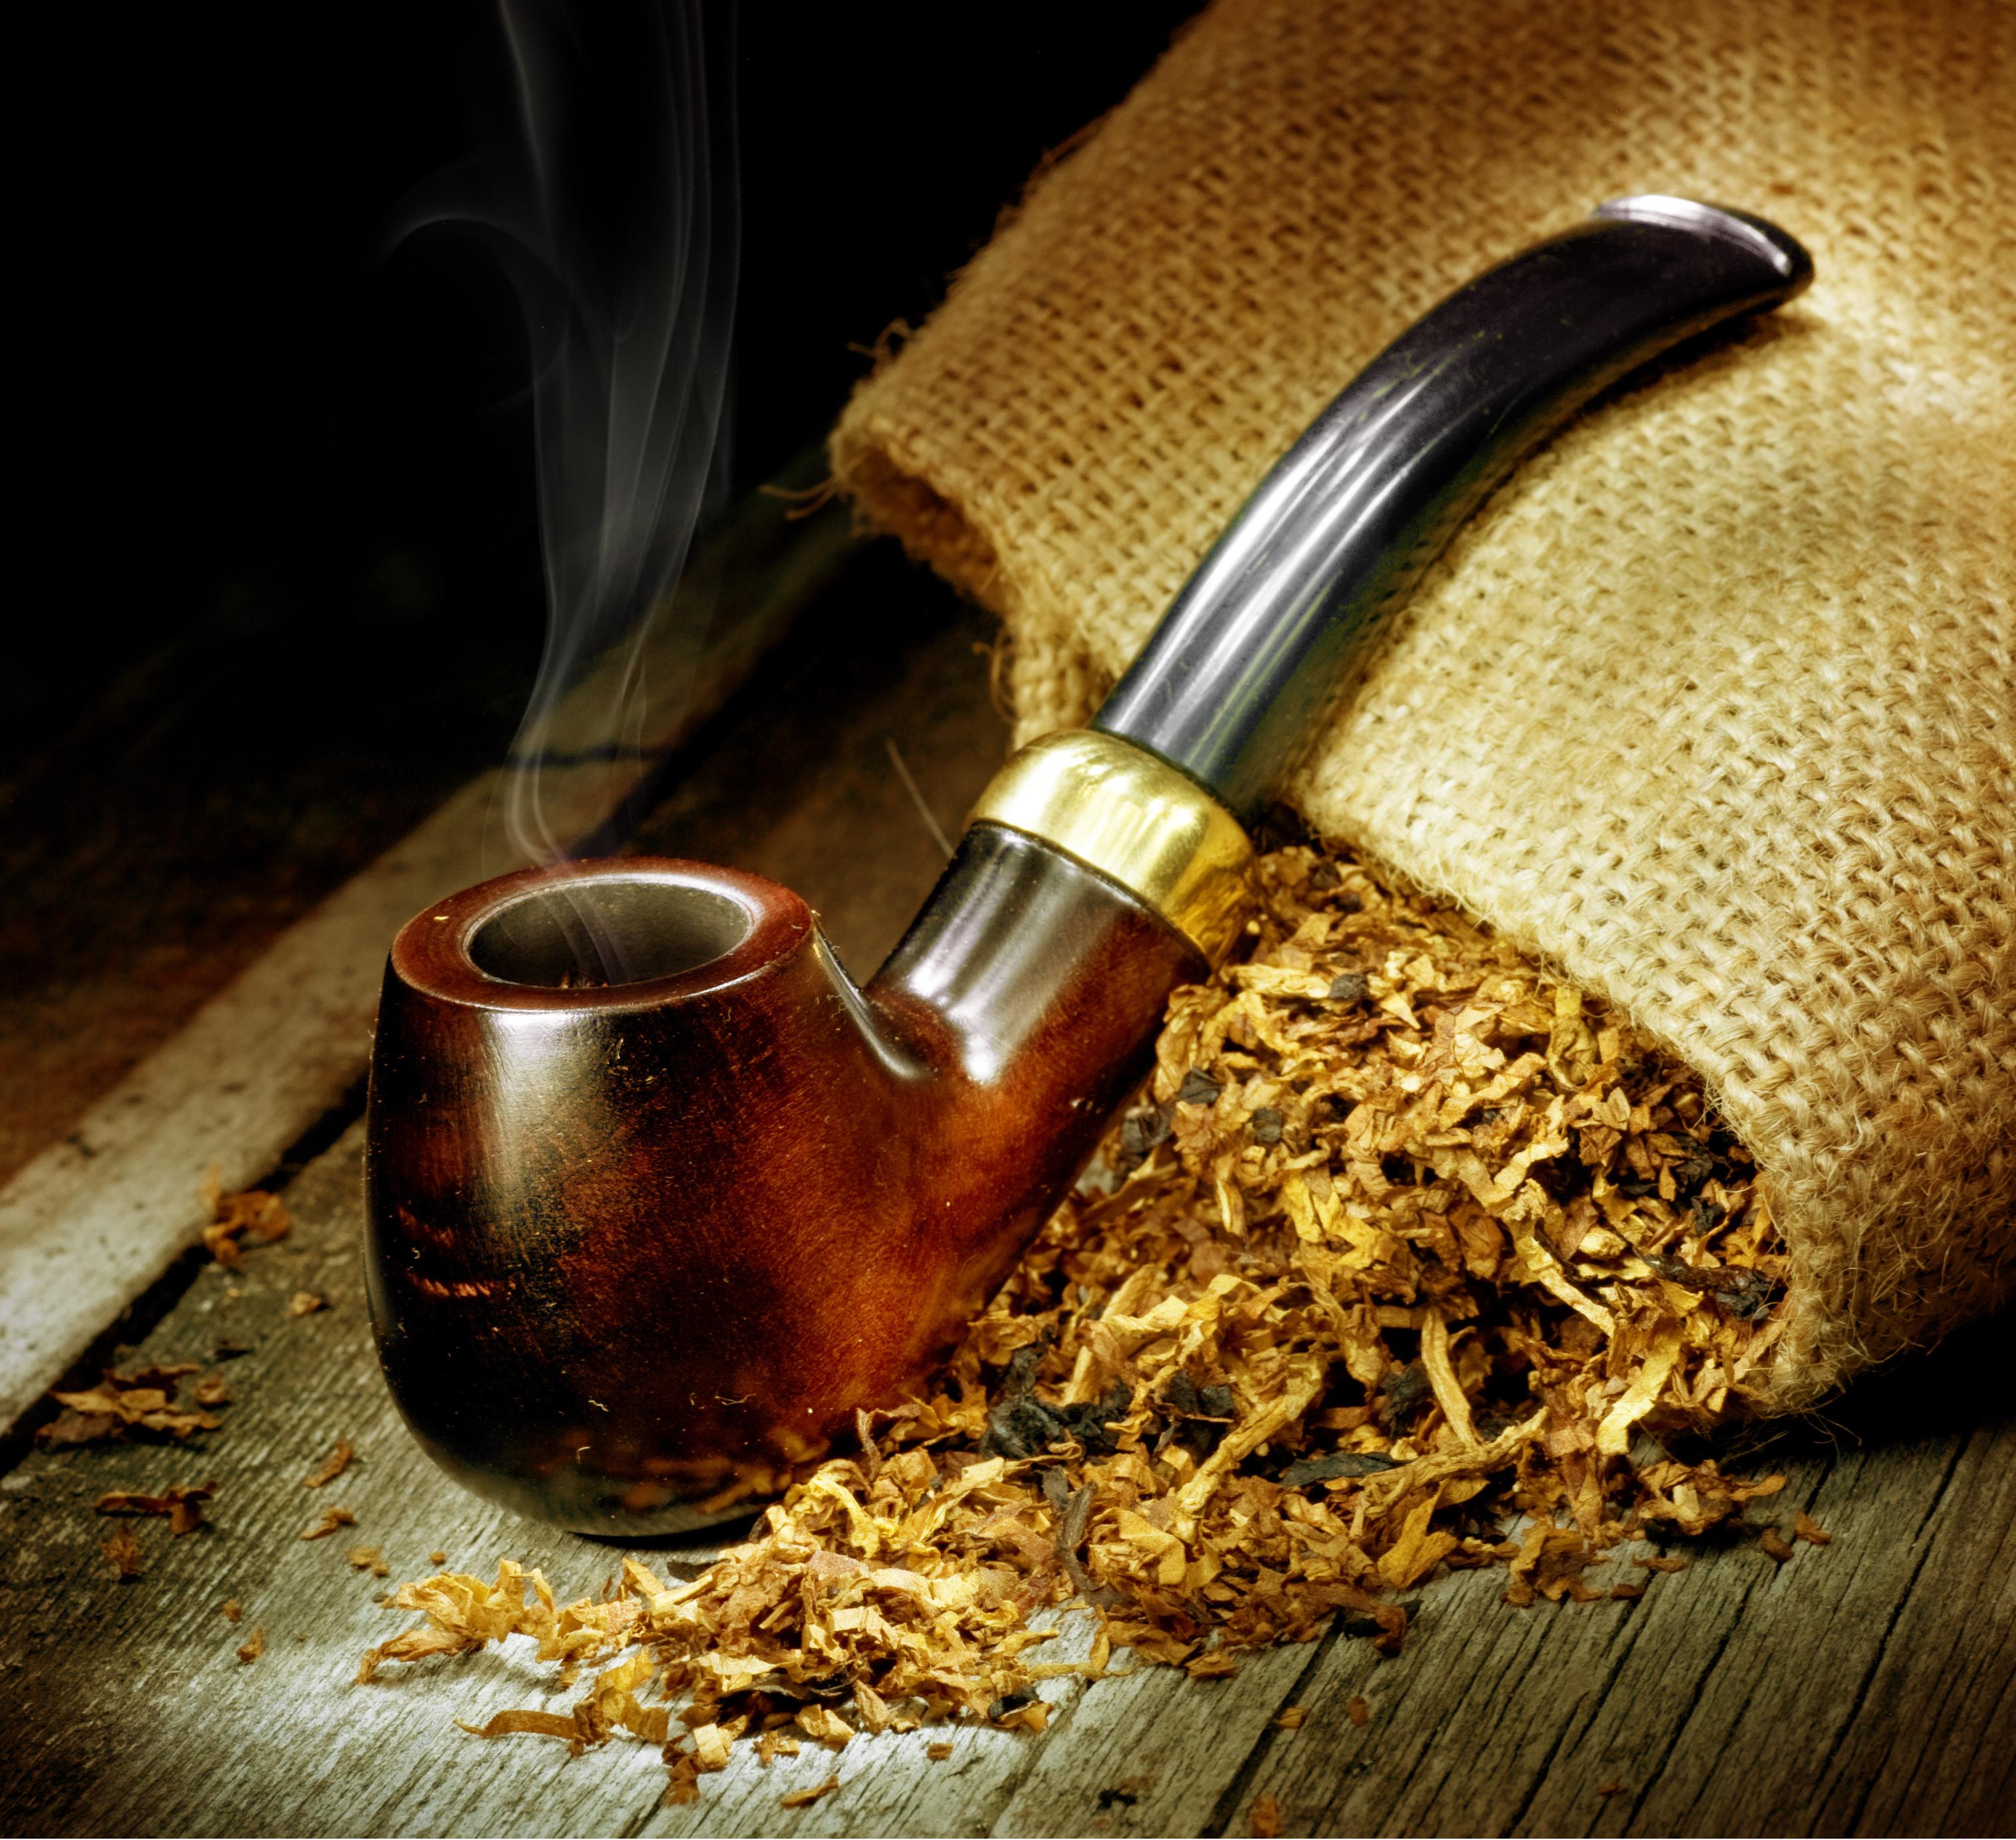 Ароматы весны 2015: женский парфюм с нотами табака